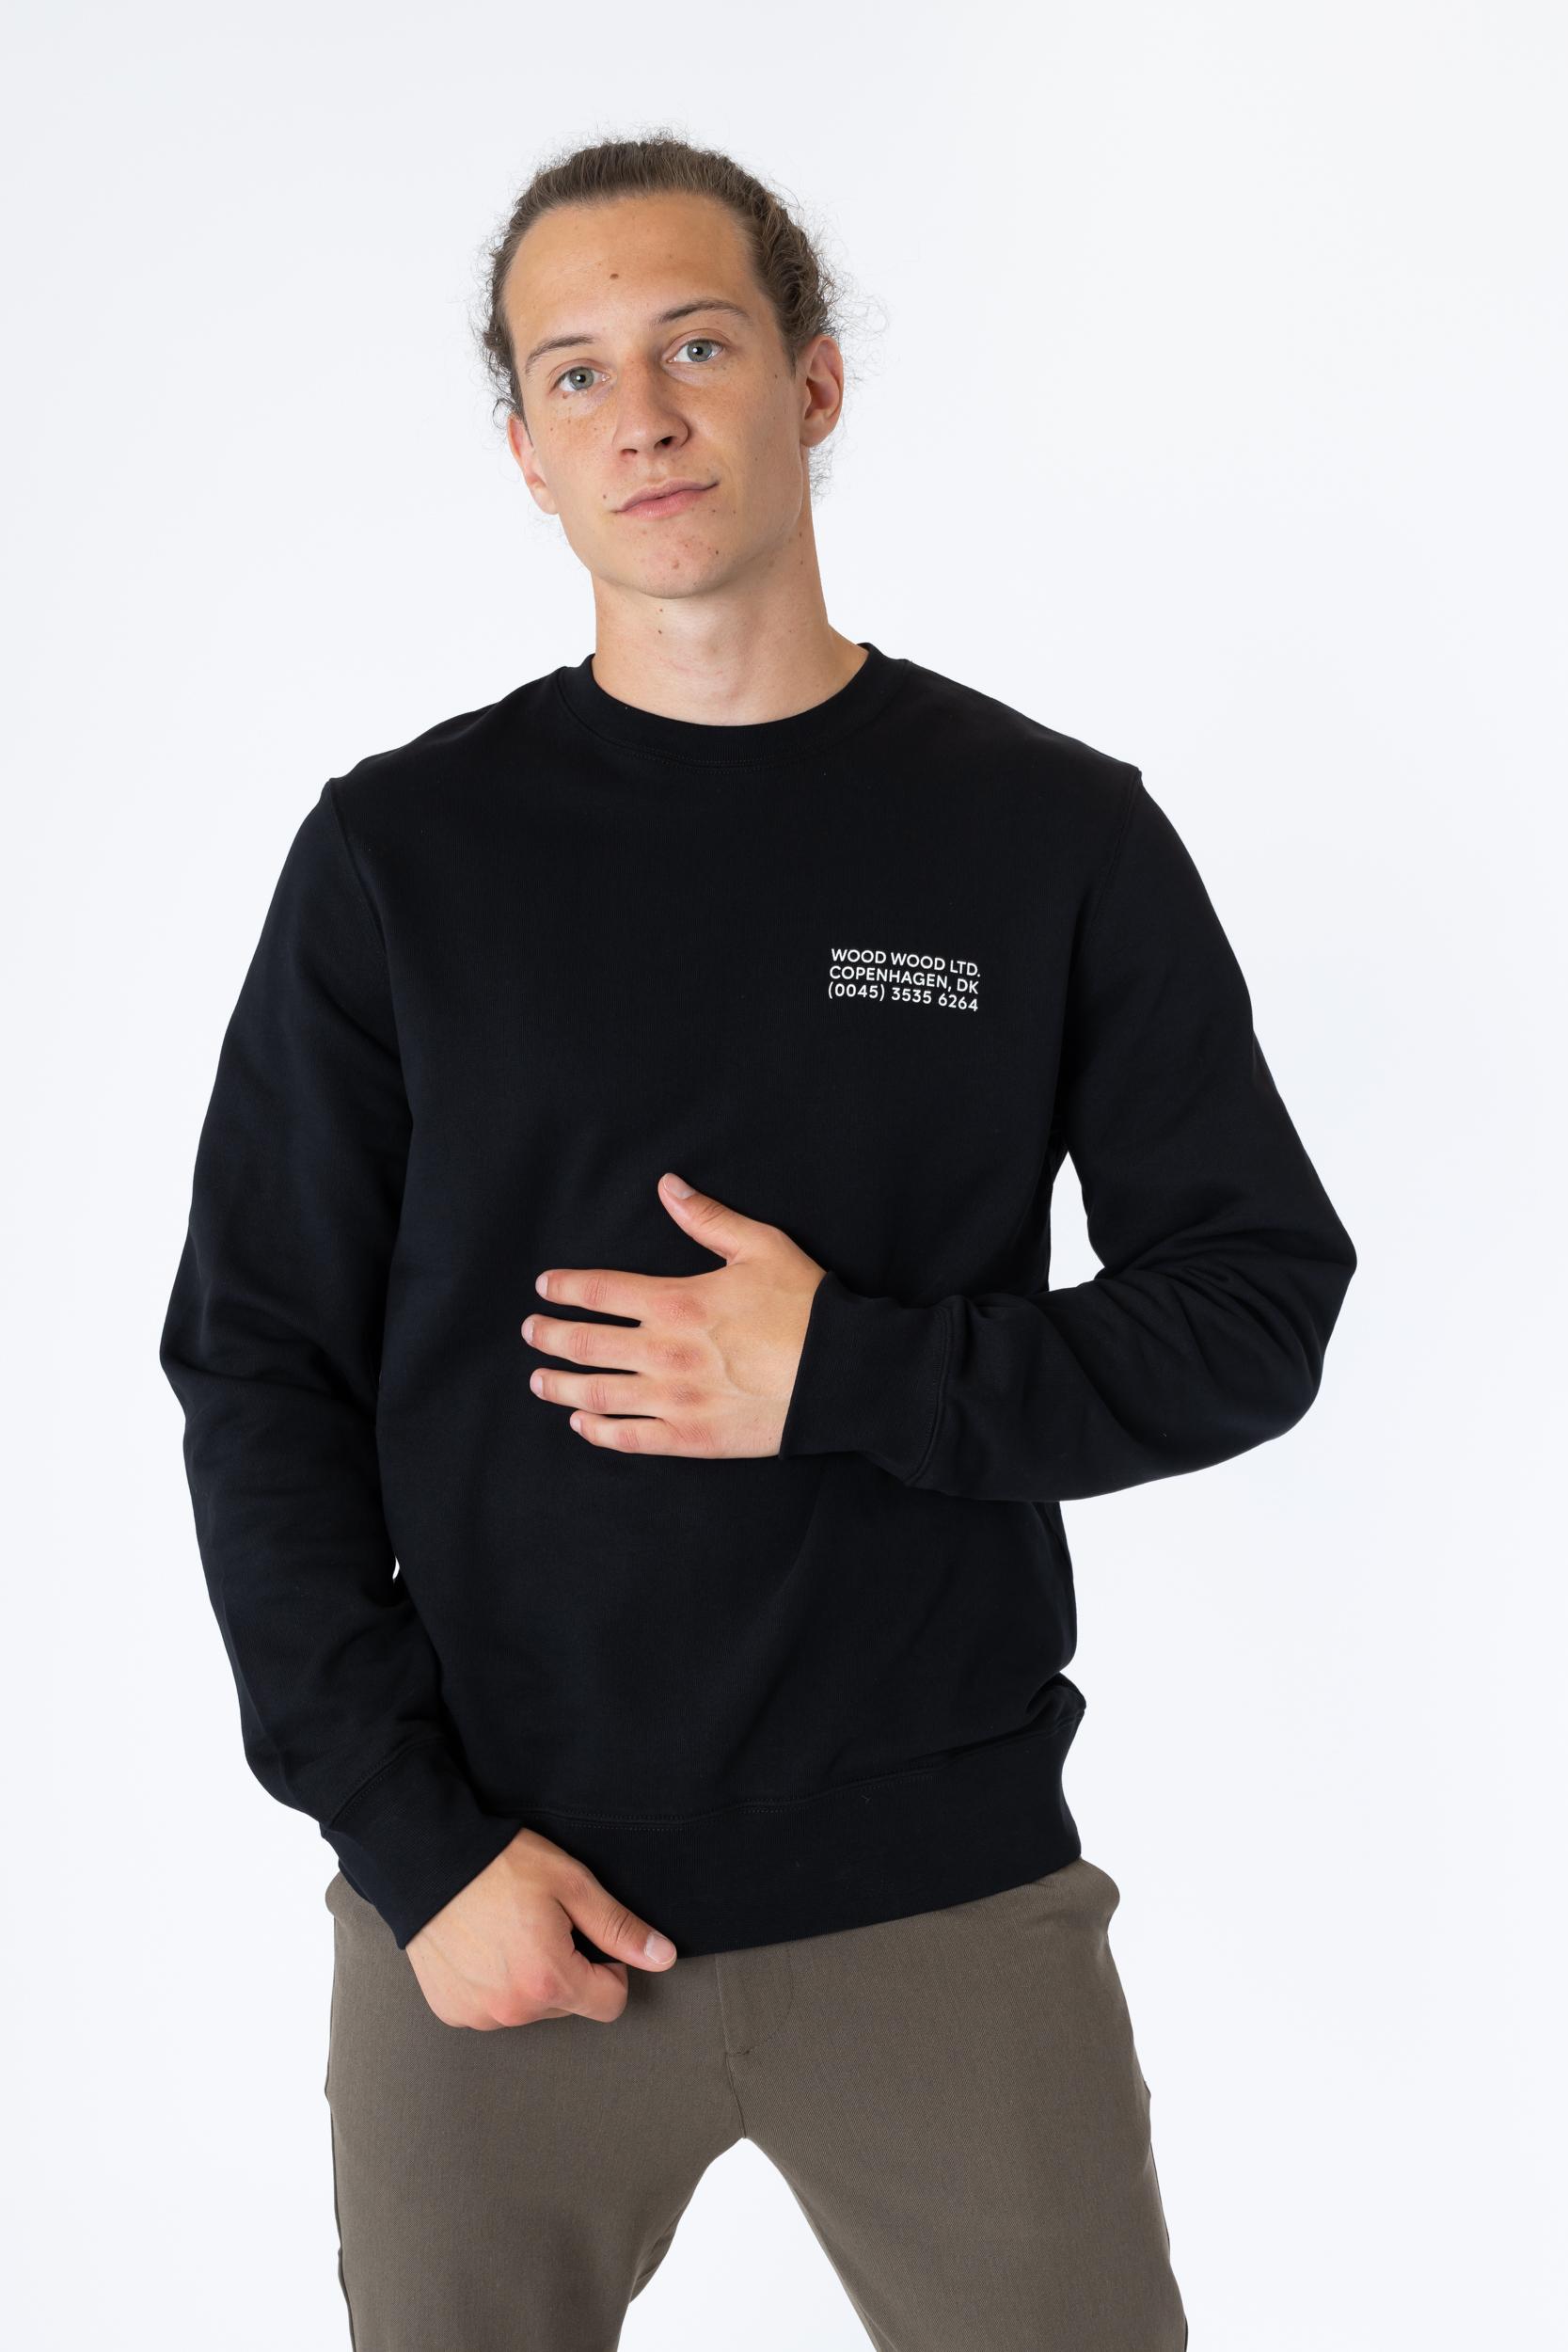 Sweatshirt Hugh info